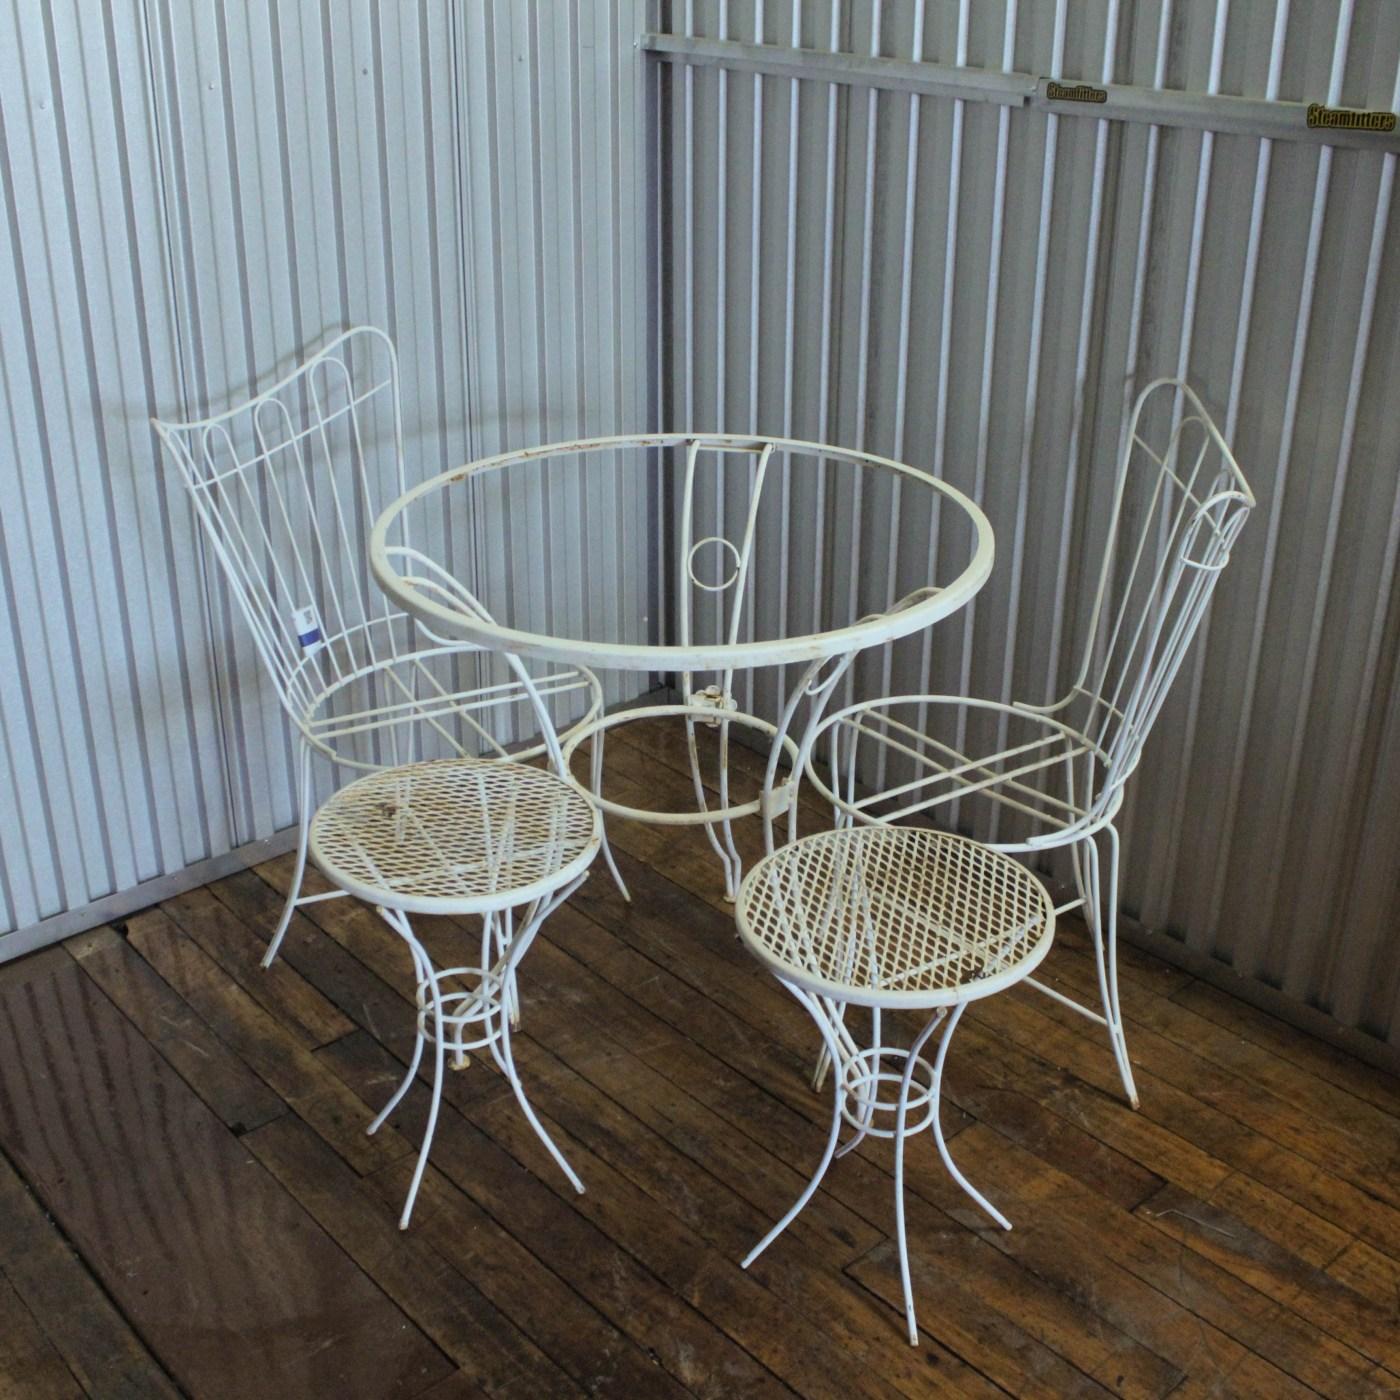 Vintage Wrought Iron Patio Furniture Ebth